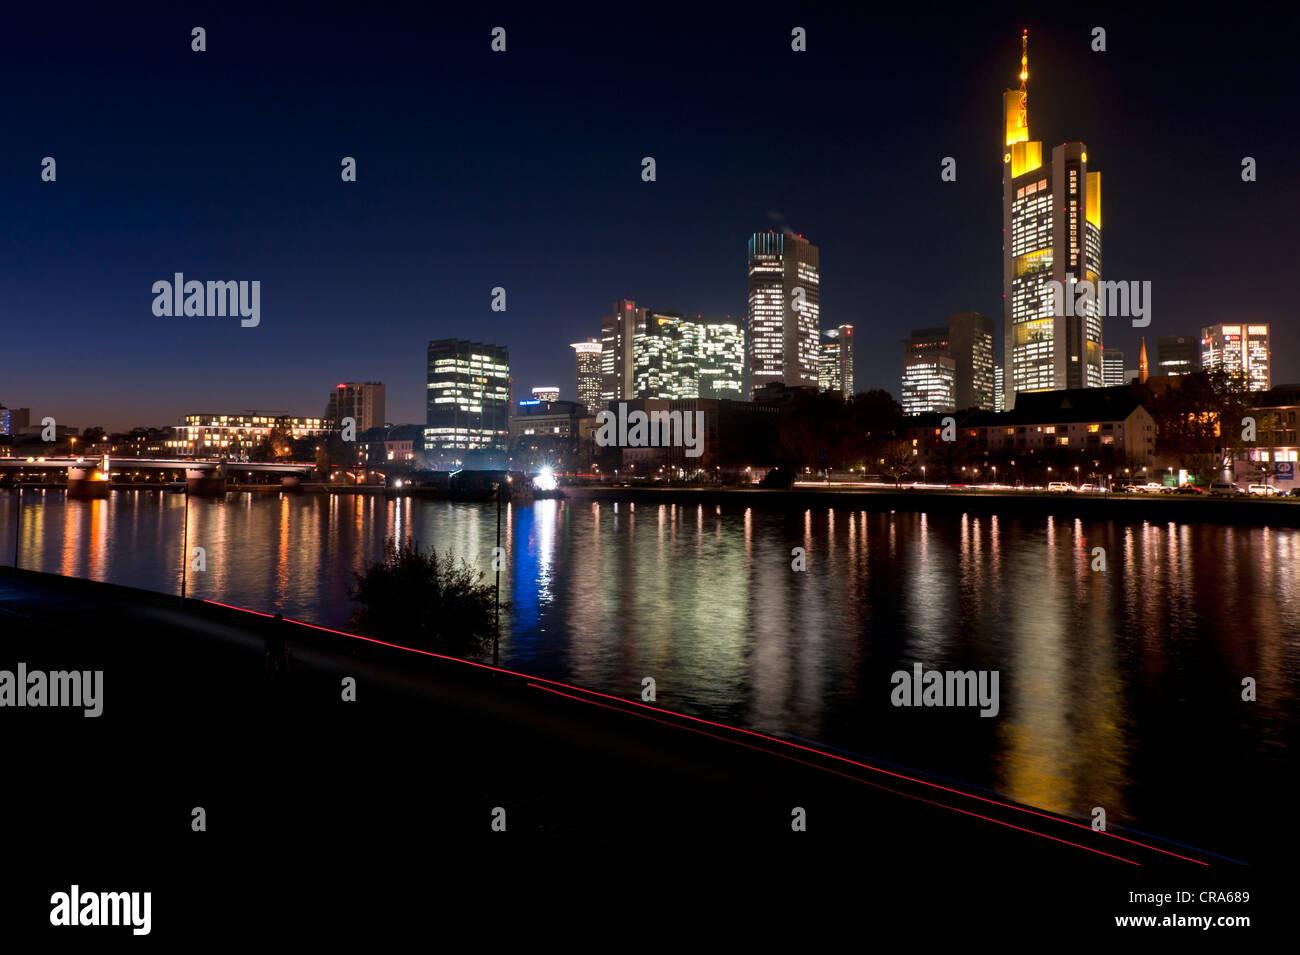 Skyline of the Bankenviertel financial district at night, Frankfurt am Main, Hesse, Germany, Europe - Stock Image